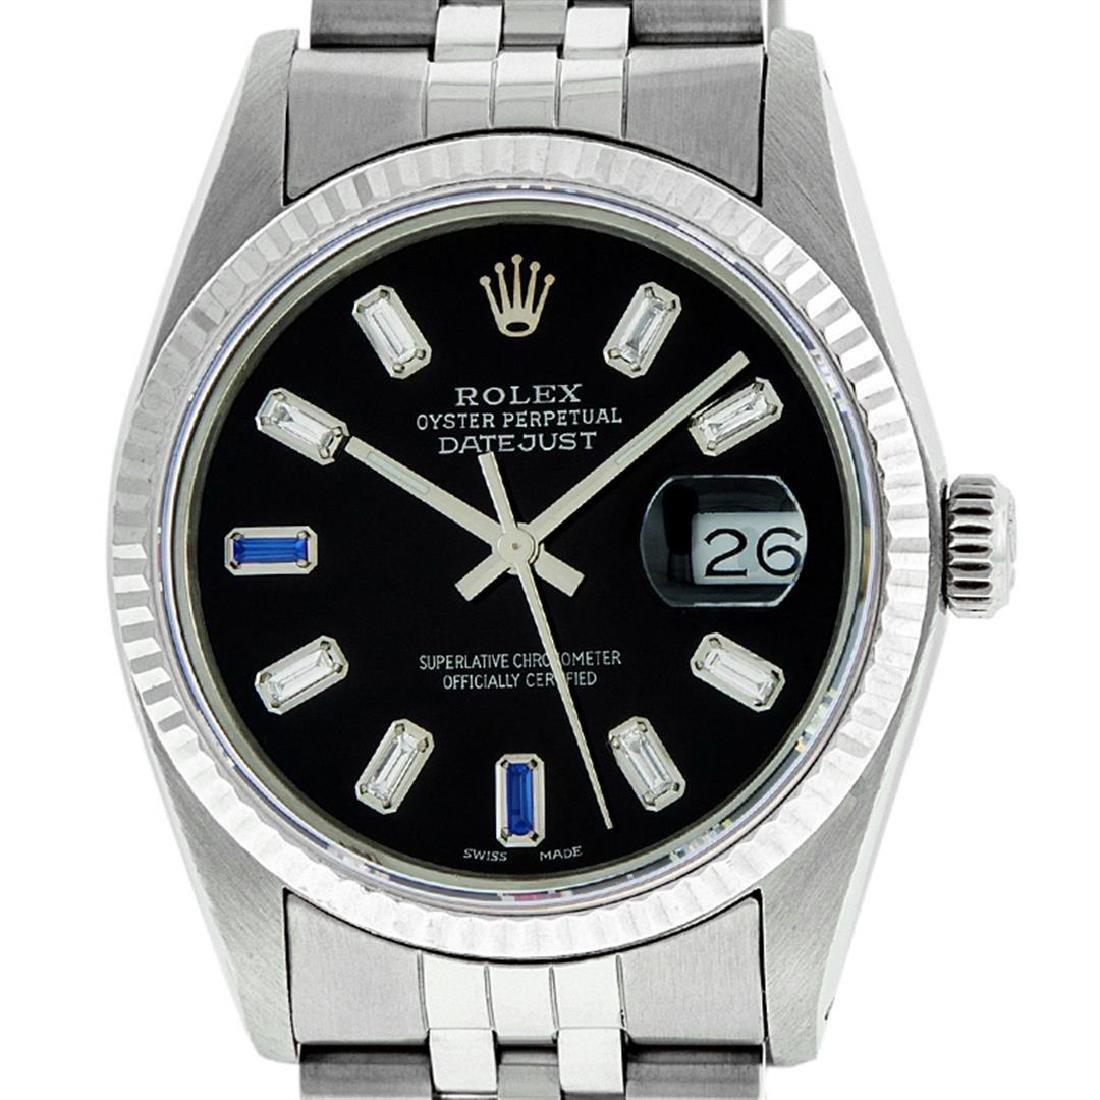 Rolex Men's Stainless Steel 36mm Black Diamond Dial